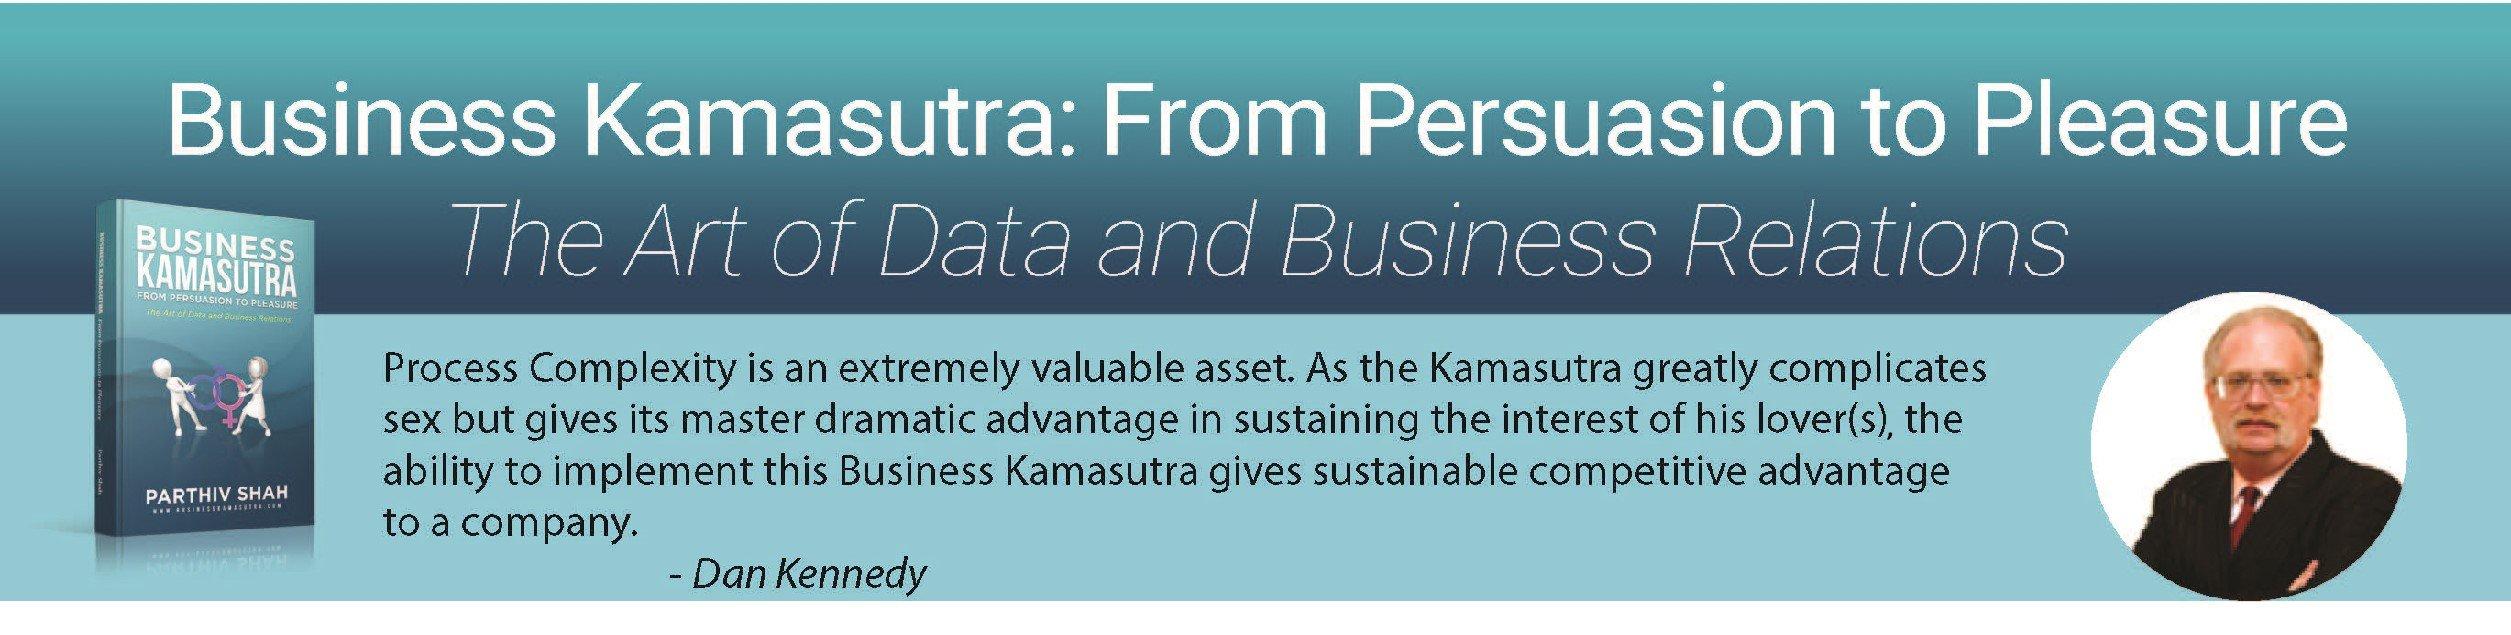 business kamasutra header